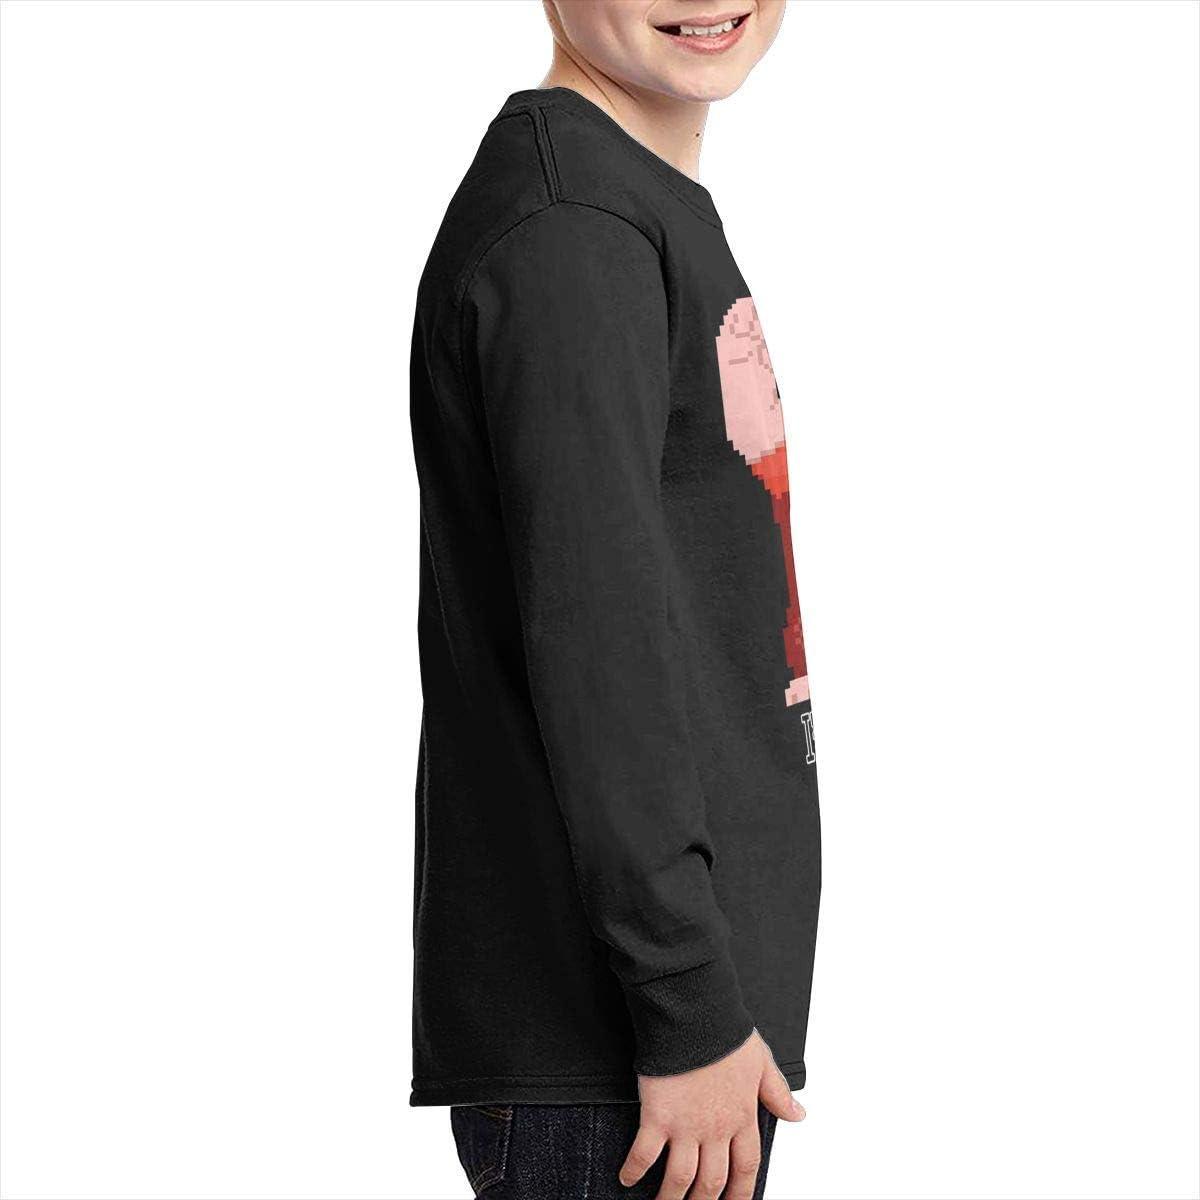 Kilsd Boys /& Girls Junior Classic Wreck It Ralph Long Sleeve T Shirt Black